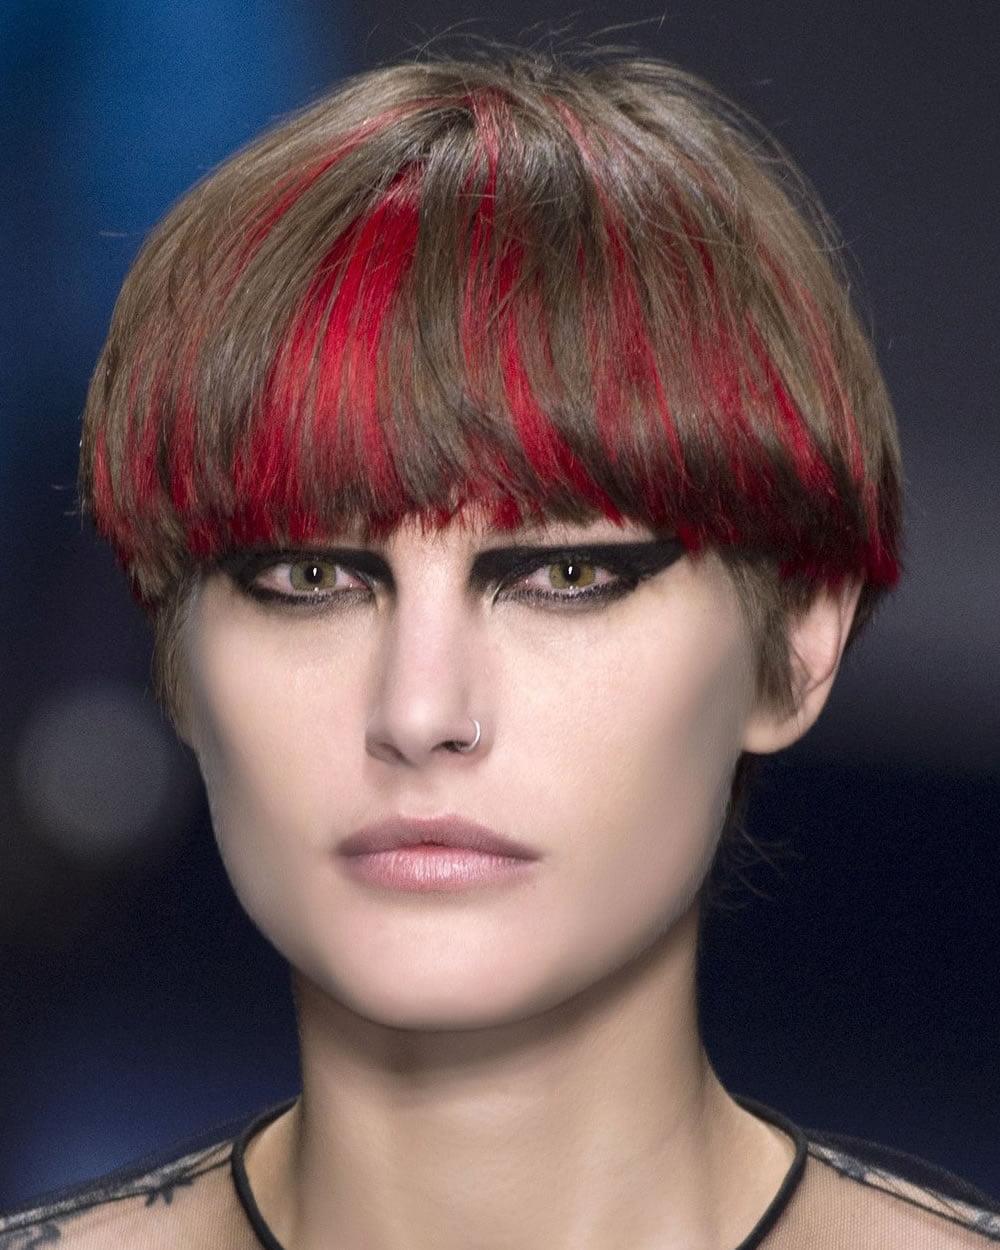 63 Unique Pixie Amp Bob Haircuts Hairstyles For Short Hair